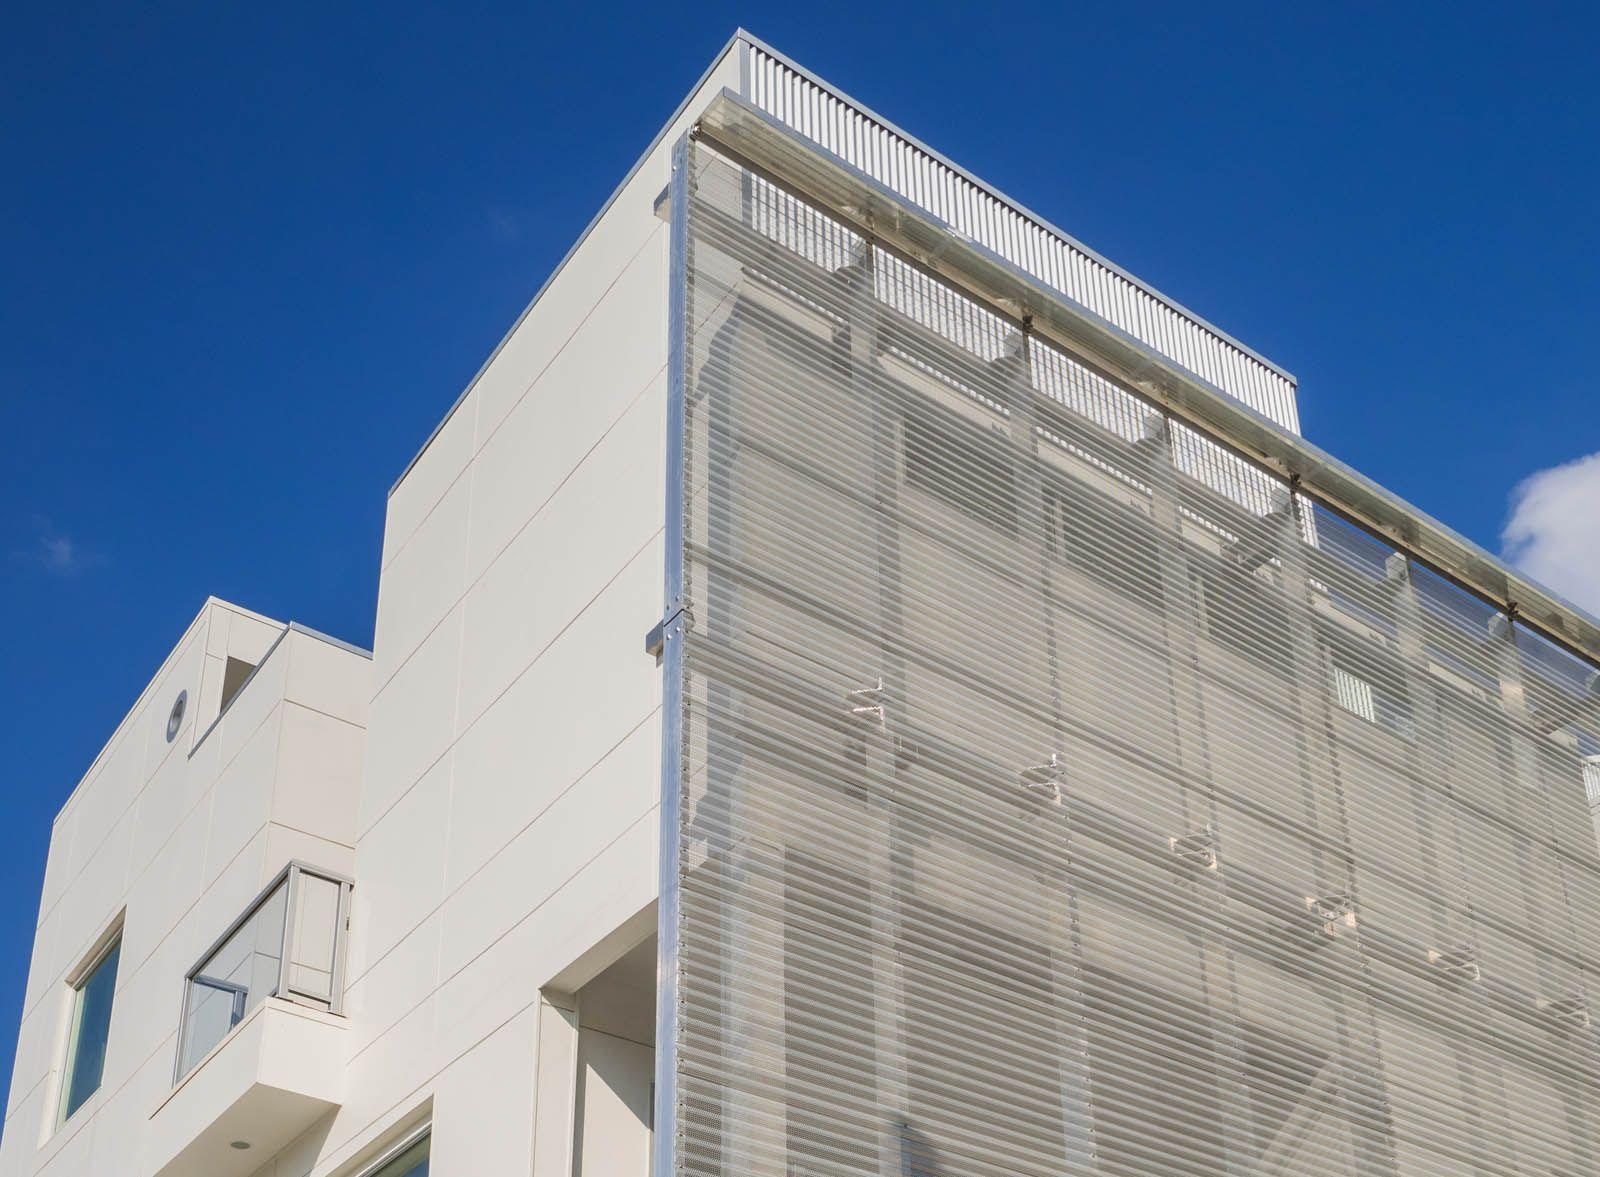 Architectural Corrugated Metal Panels Corrugated Metal